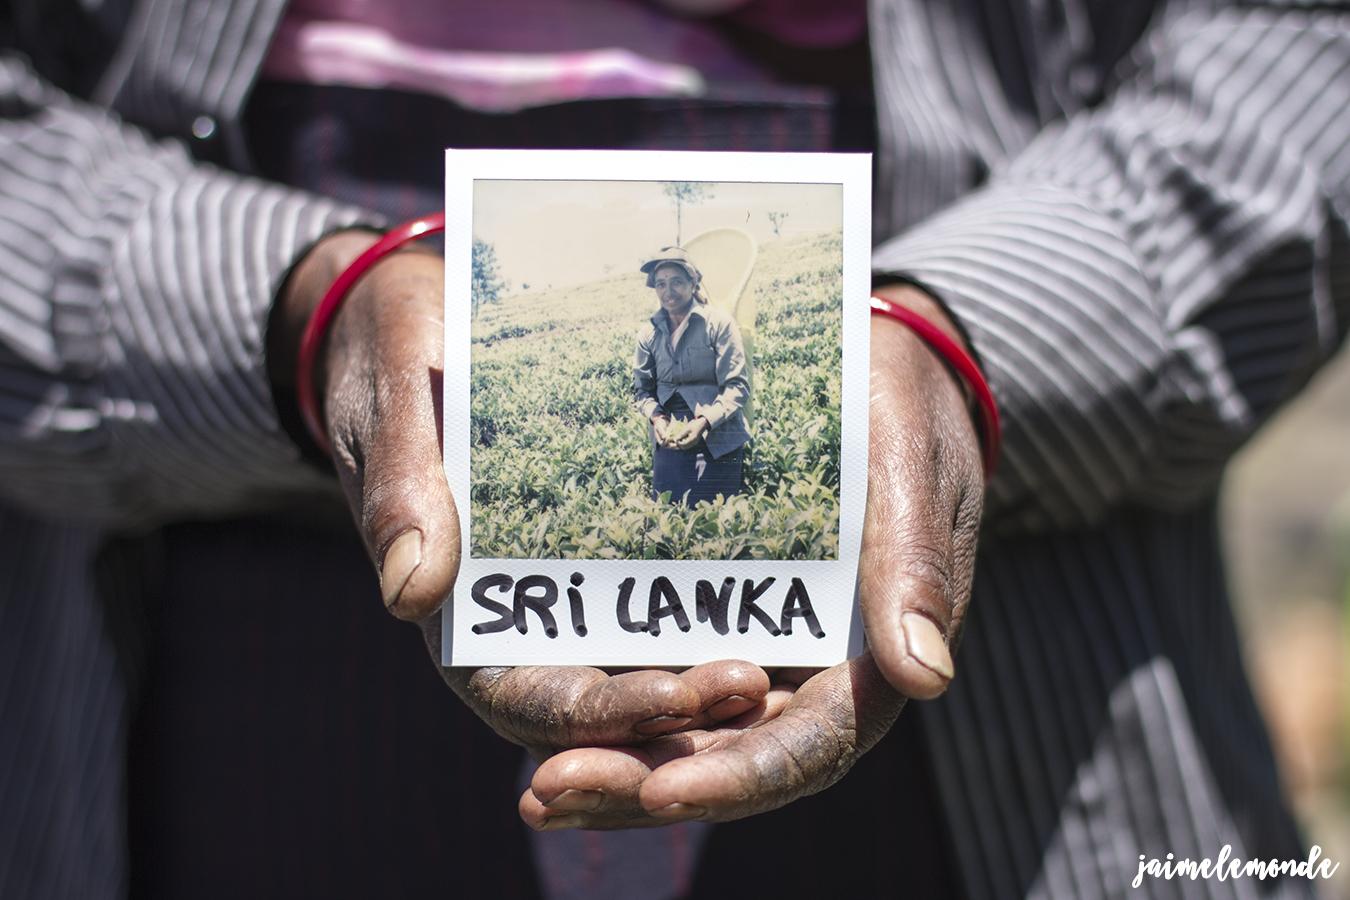 des-polas-et-des-mains-voyage-au-sri-lanka-2016-jaimelemonde-4